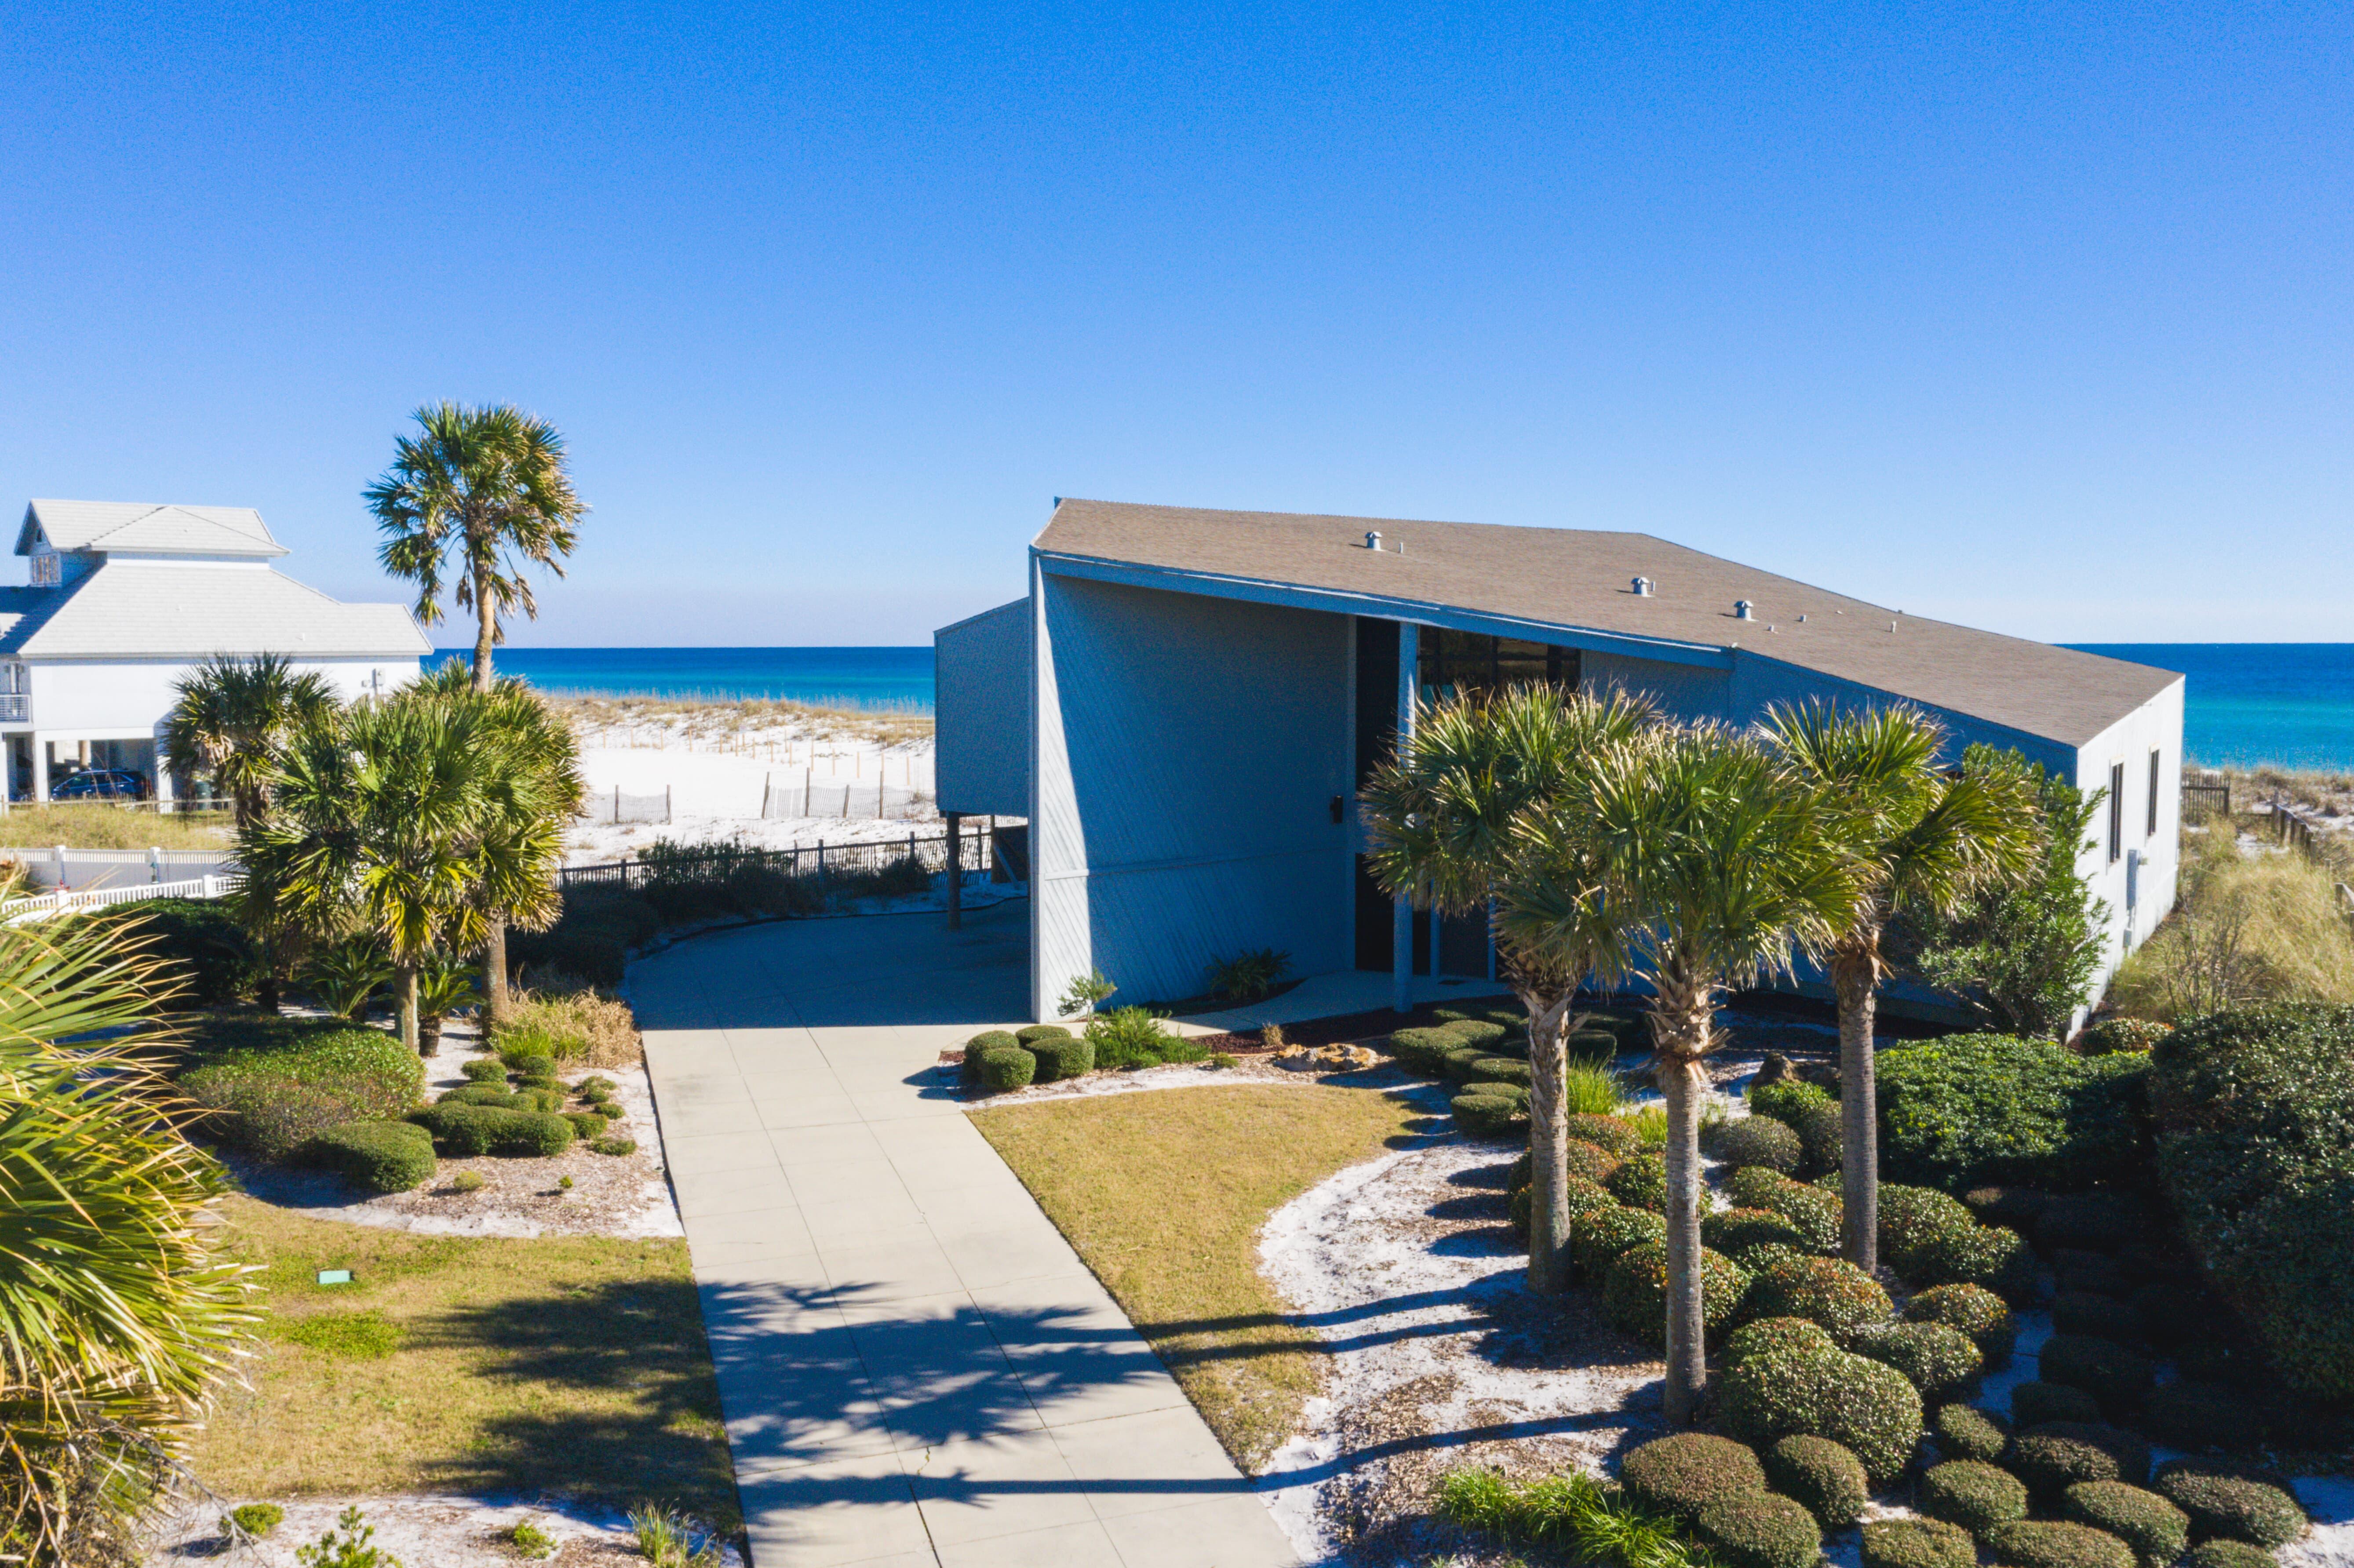 Ensenada Cinco 1736 House/Cottage rental in Pensacola Beach House Rentals in Pensacola Beach Florida - #43